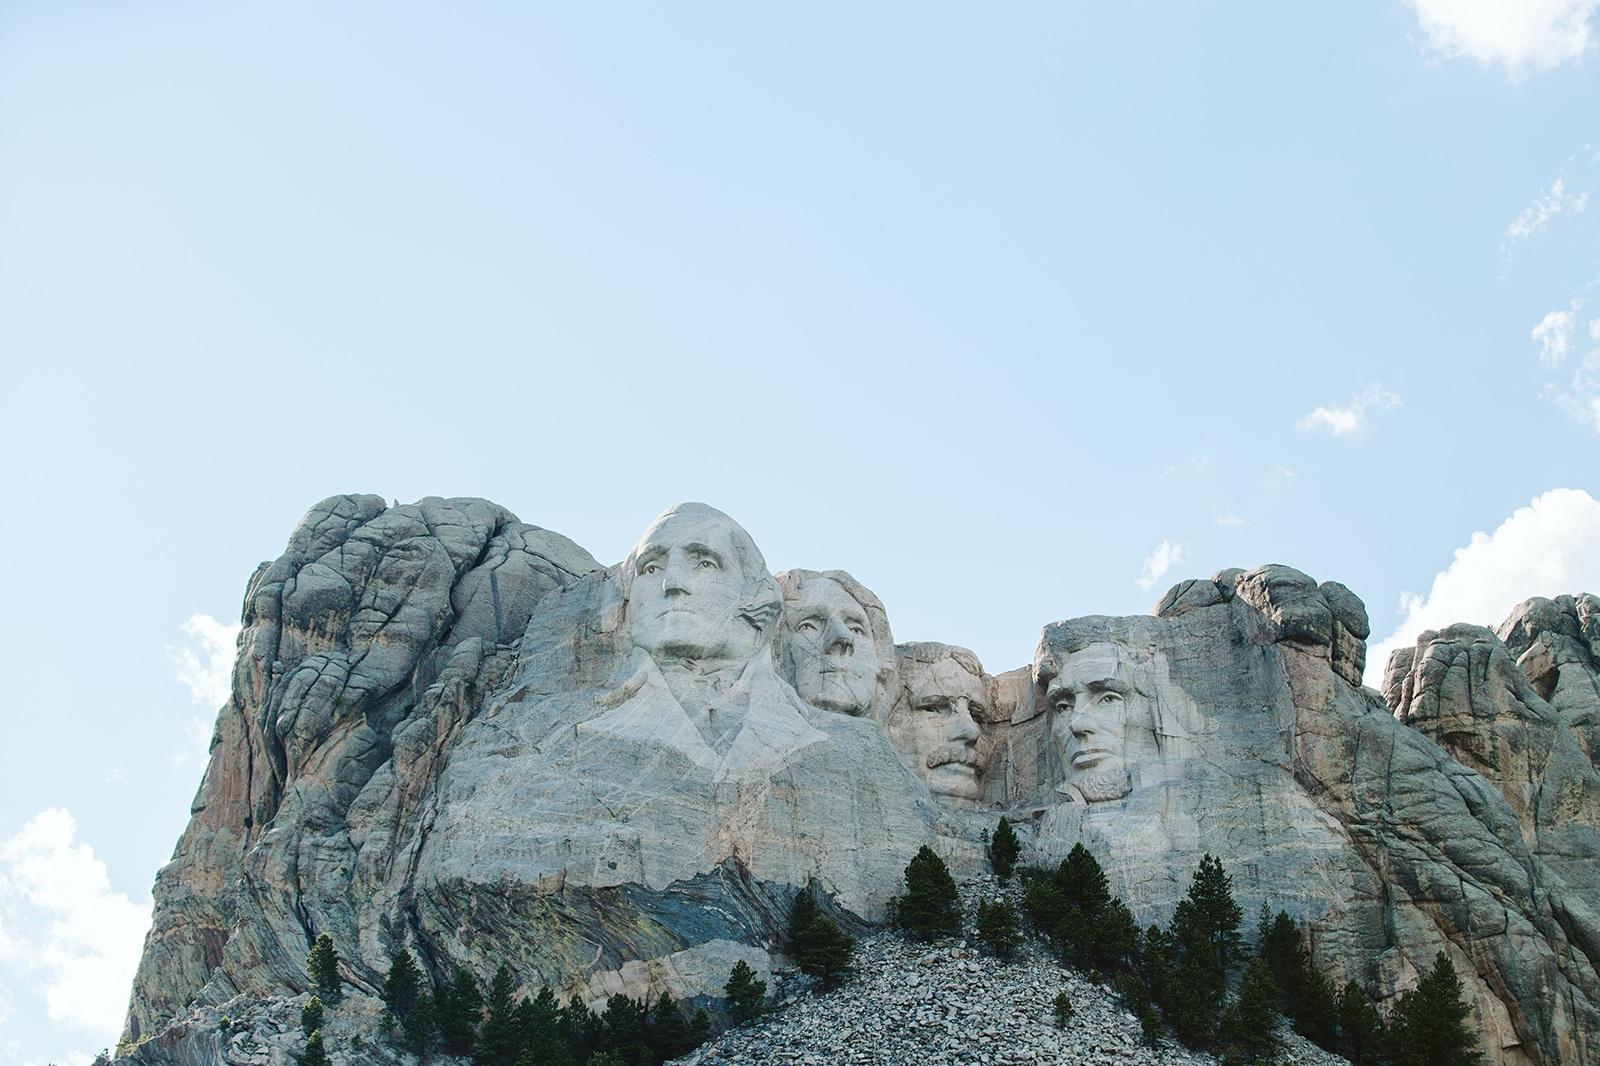 Copy of Under Canvas - Mt. Rushmore, South Dakota